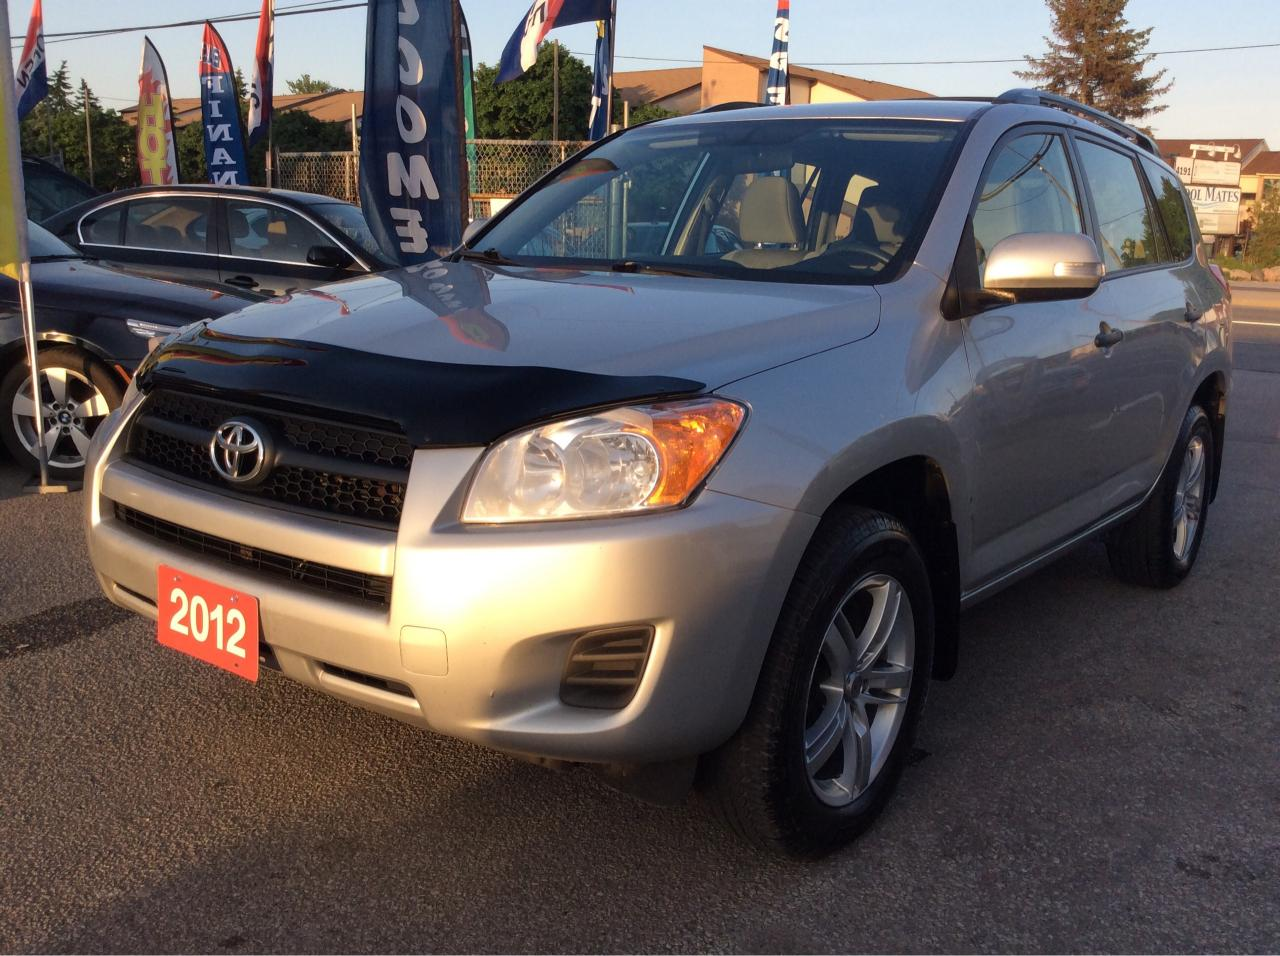 2012 Toyota RAV4 2.5L 4Cyl./4WD/Bluetooth/AUX input/Alloys